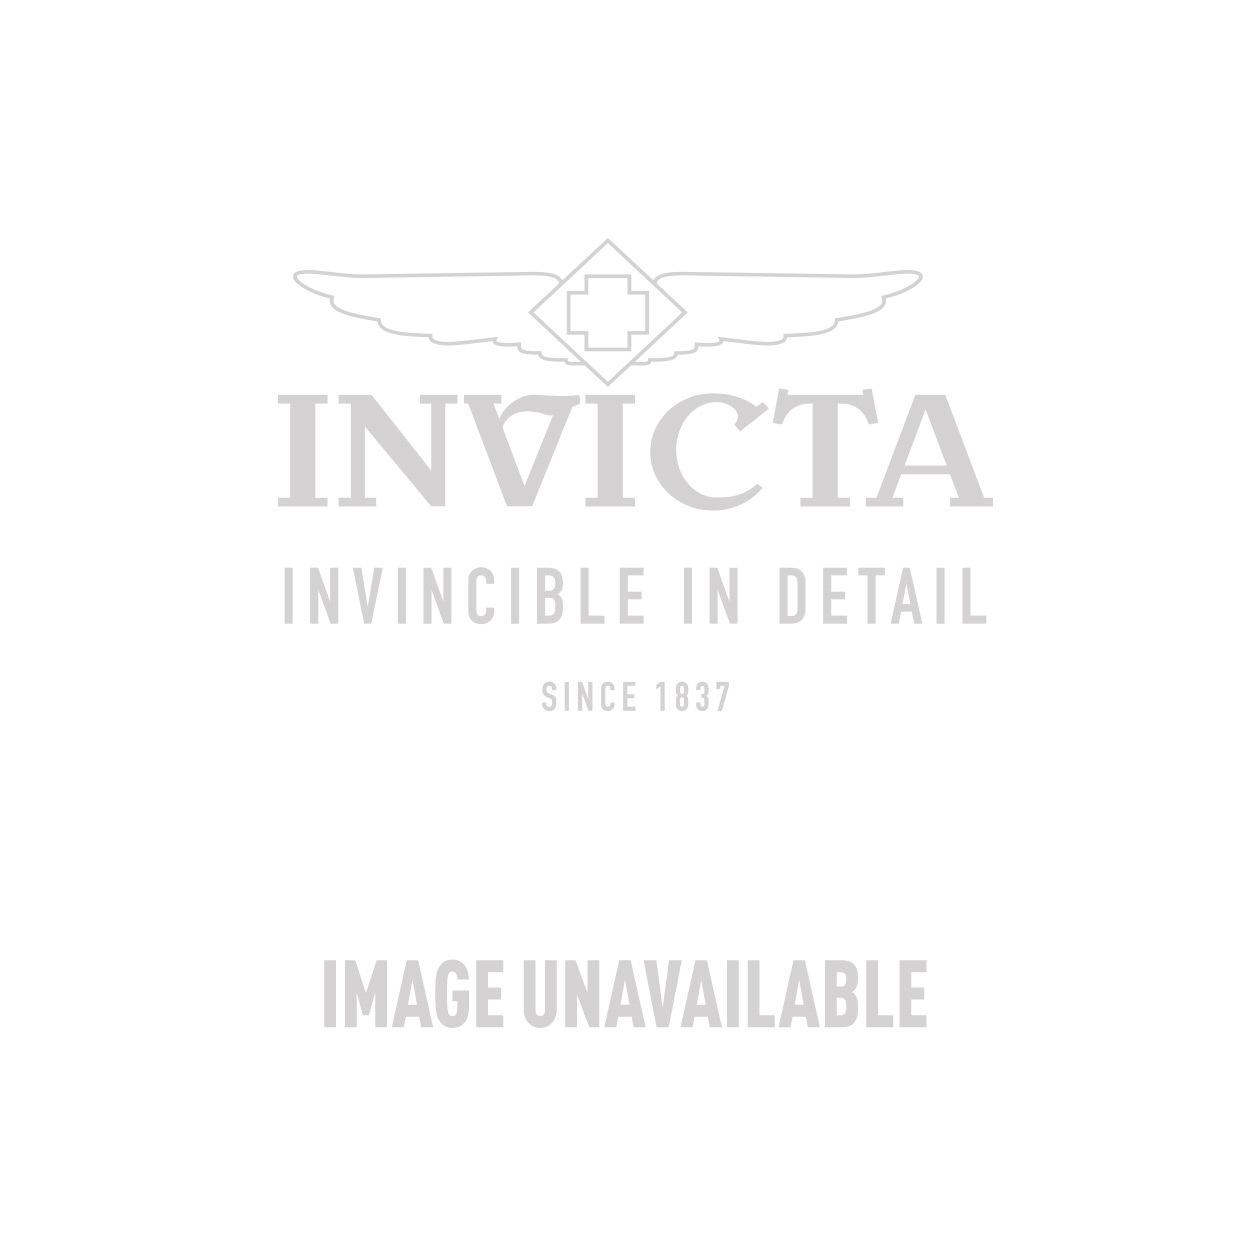 Invicta Aviator Quartz Watch - Black case with Black tone Leather band - Model 19671